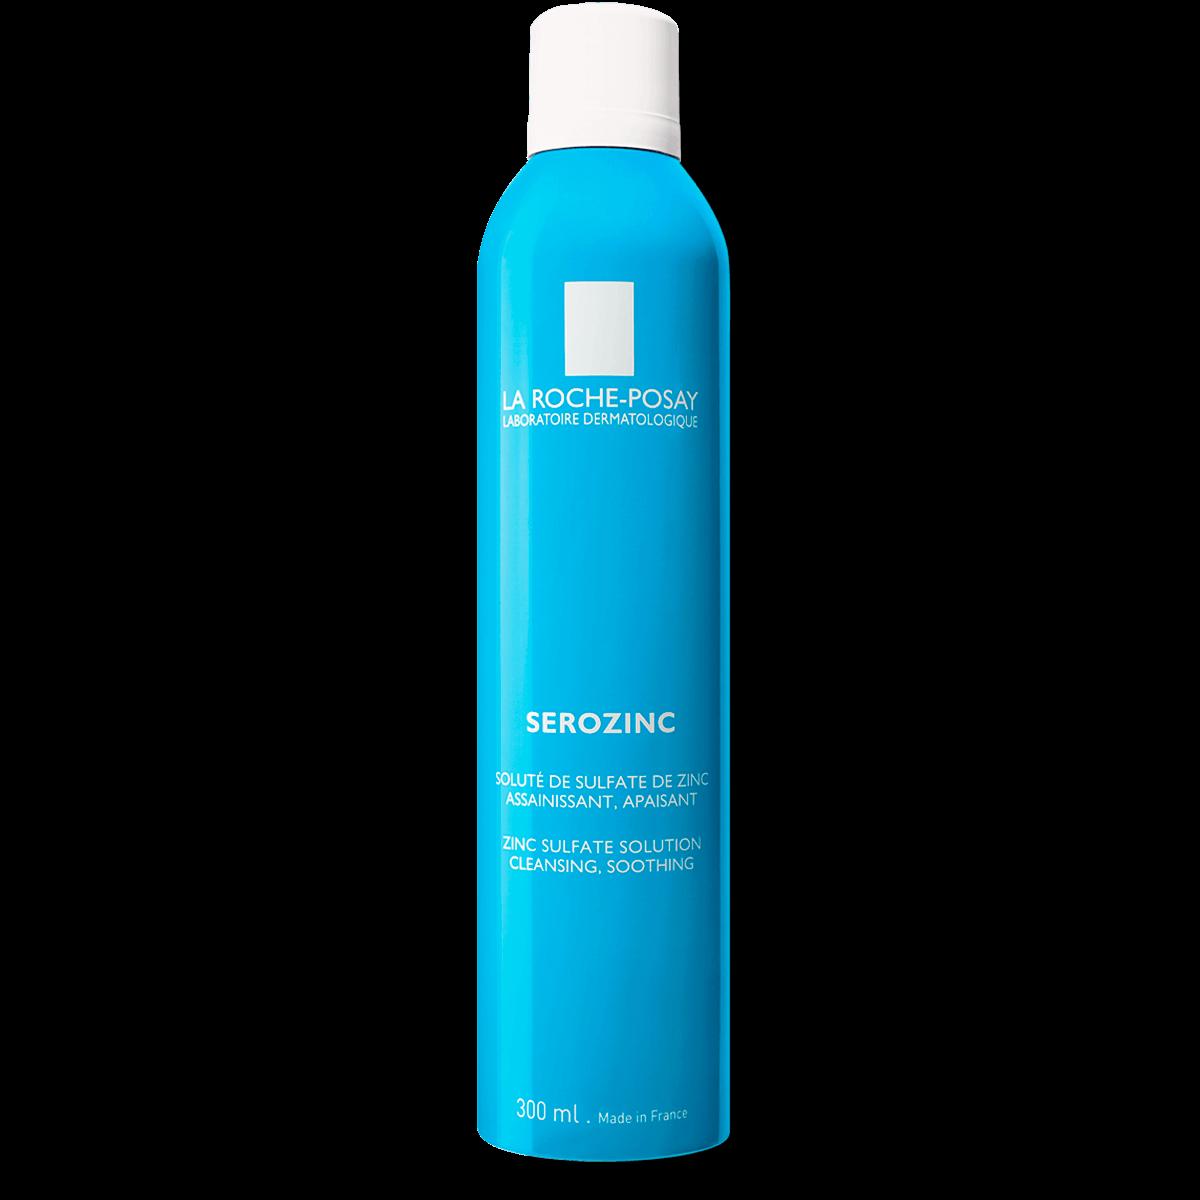 La Roche Posay ProduktSide Serozinc Spray Zink 300ml 3337875565783 For